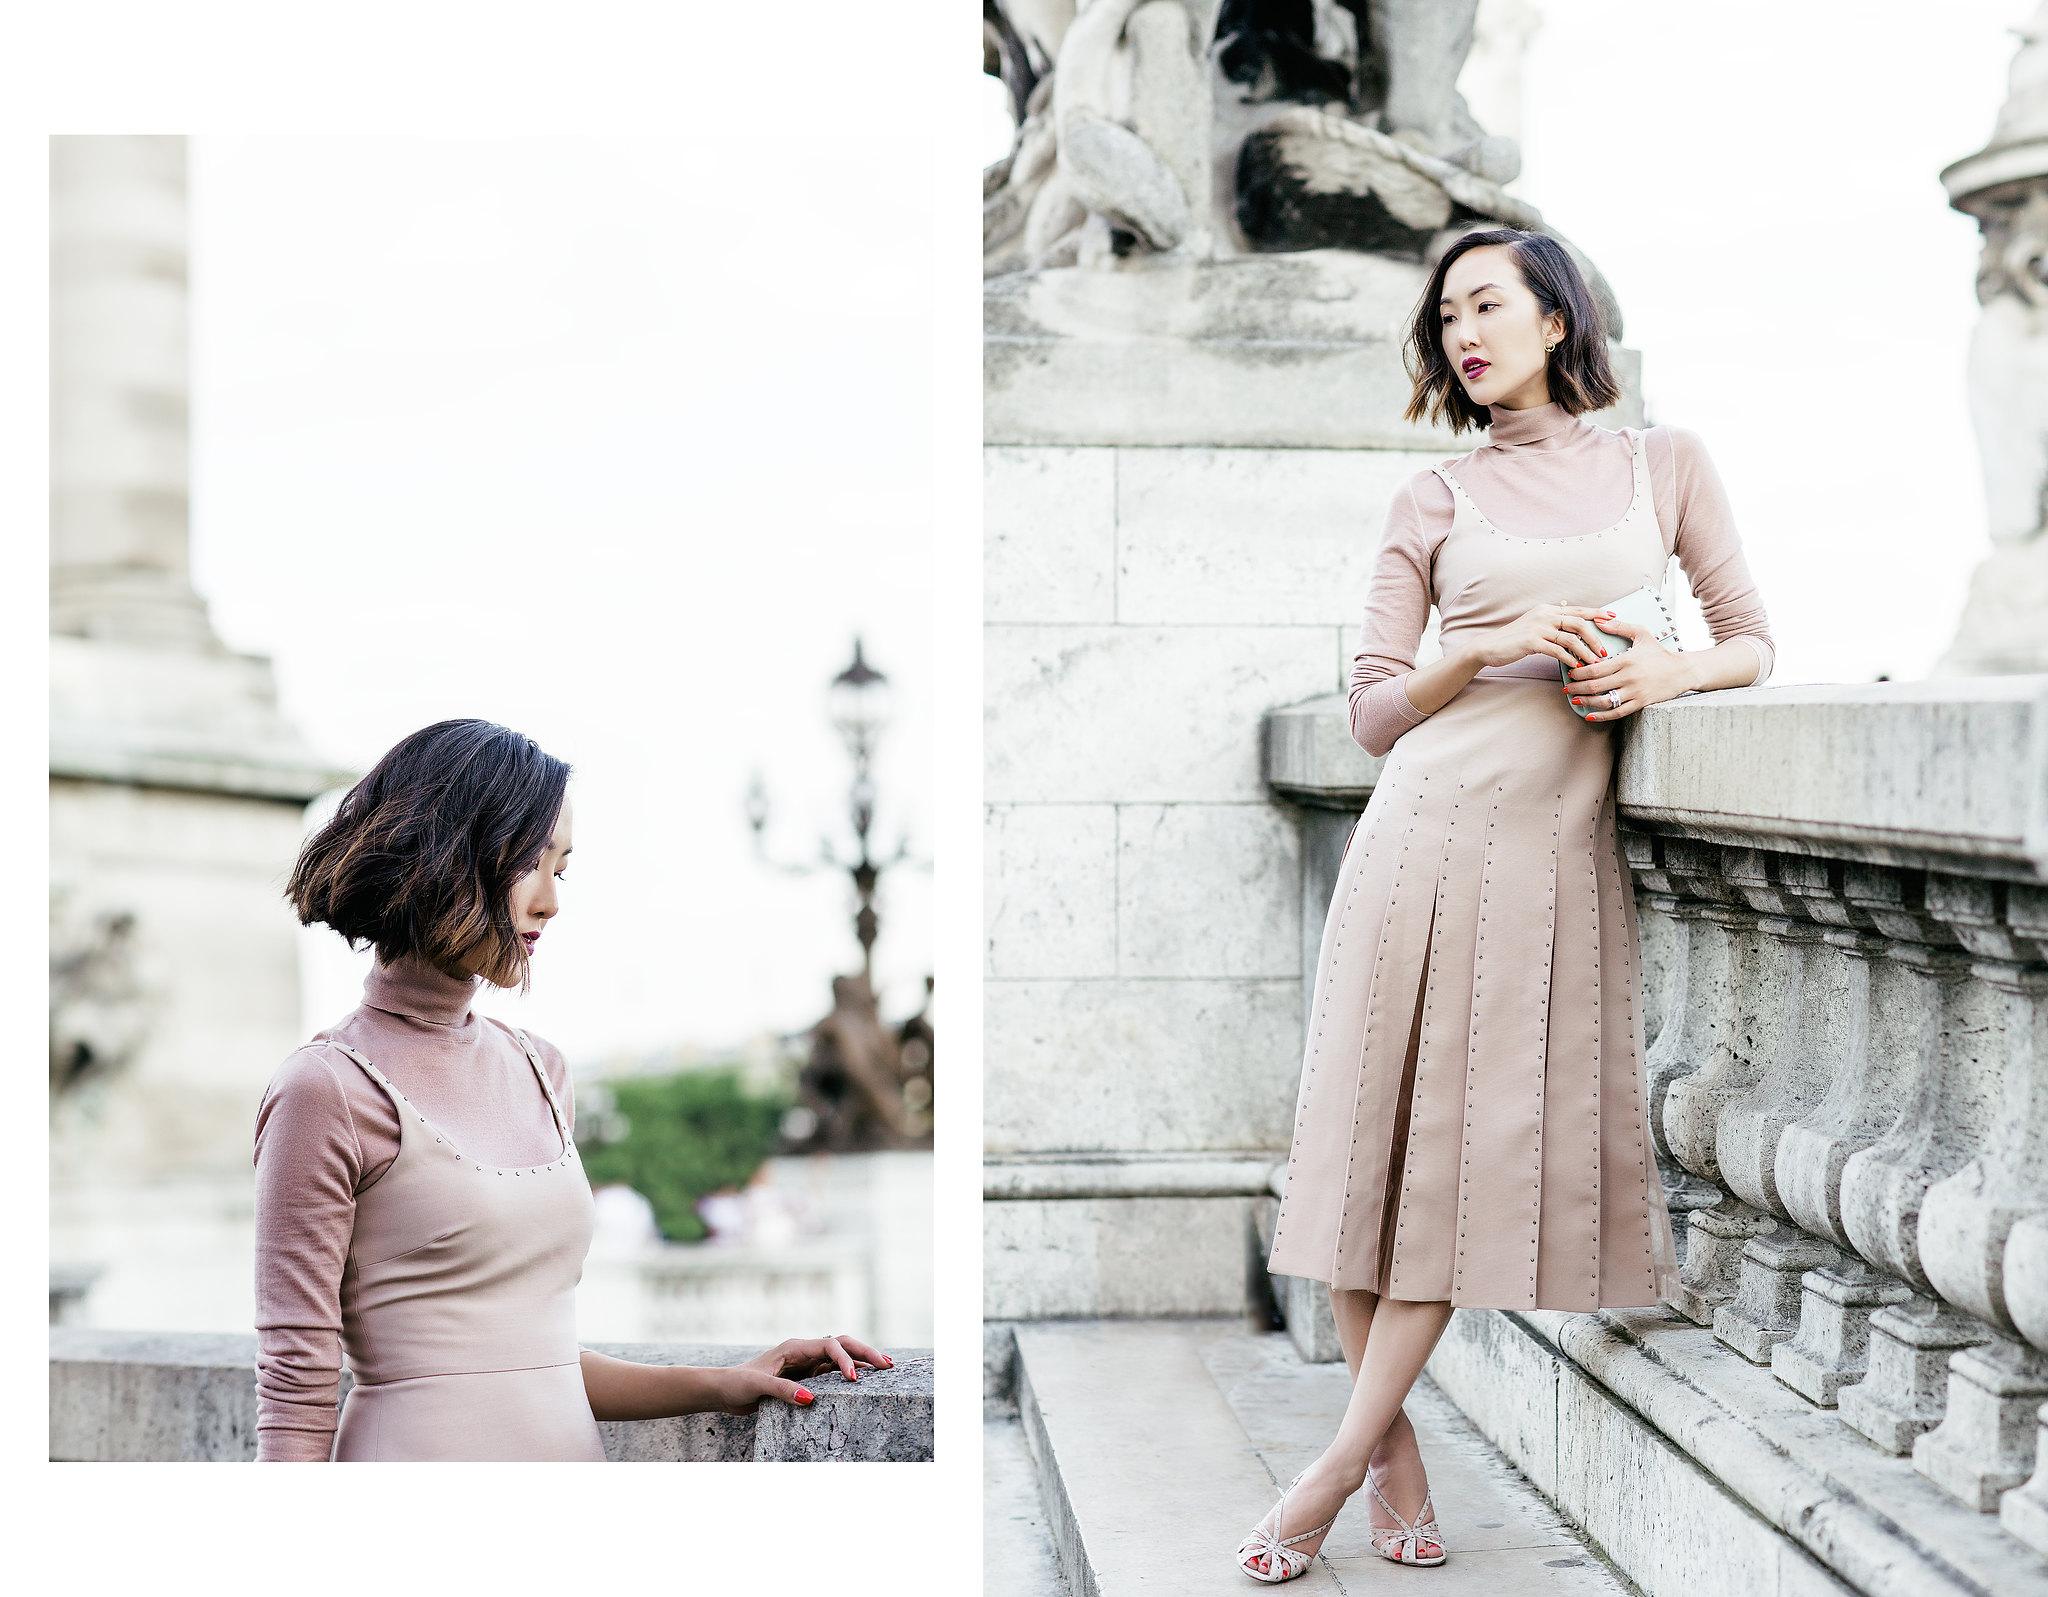 Chriselle Lim, Valentino